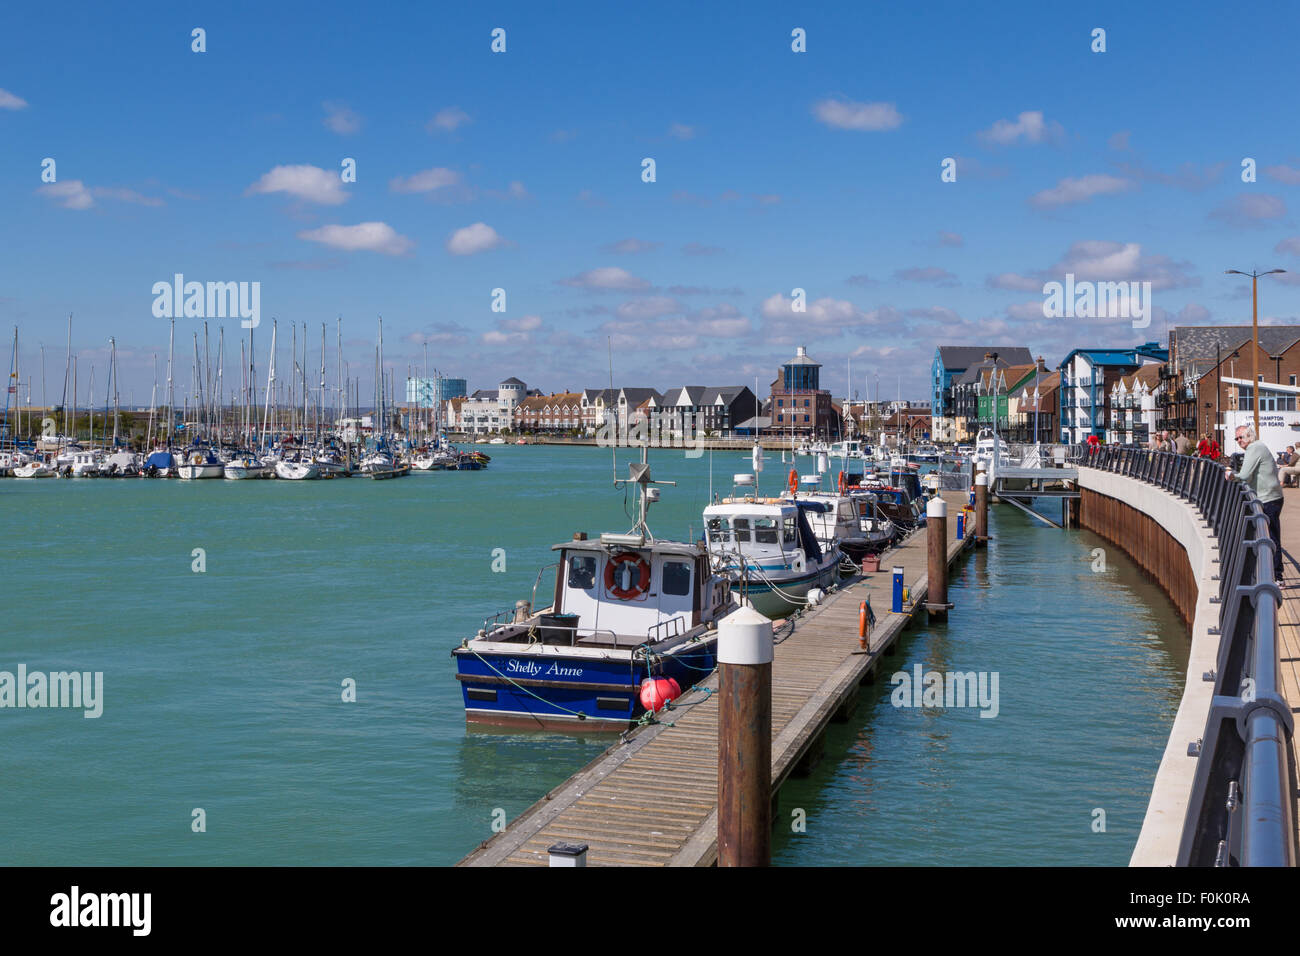 Littlehampton harbour at hight tide looking inland. - Stock Image